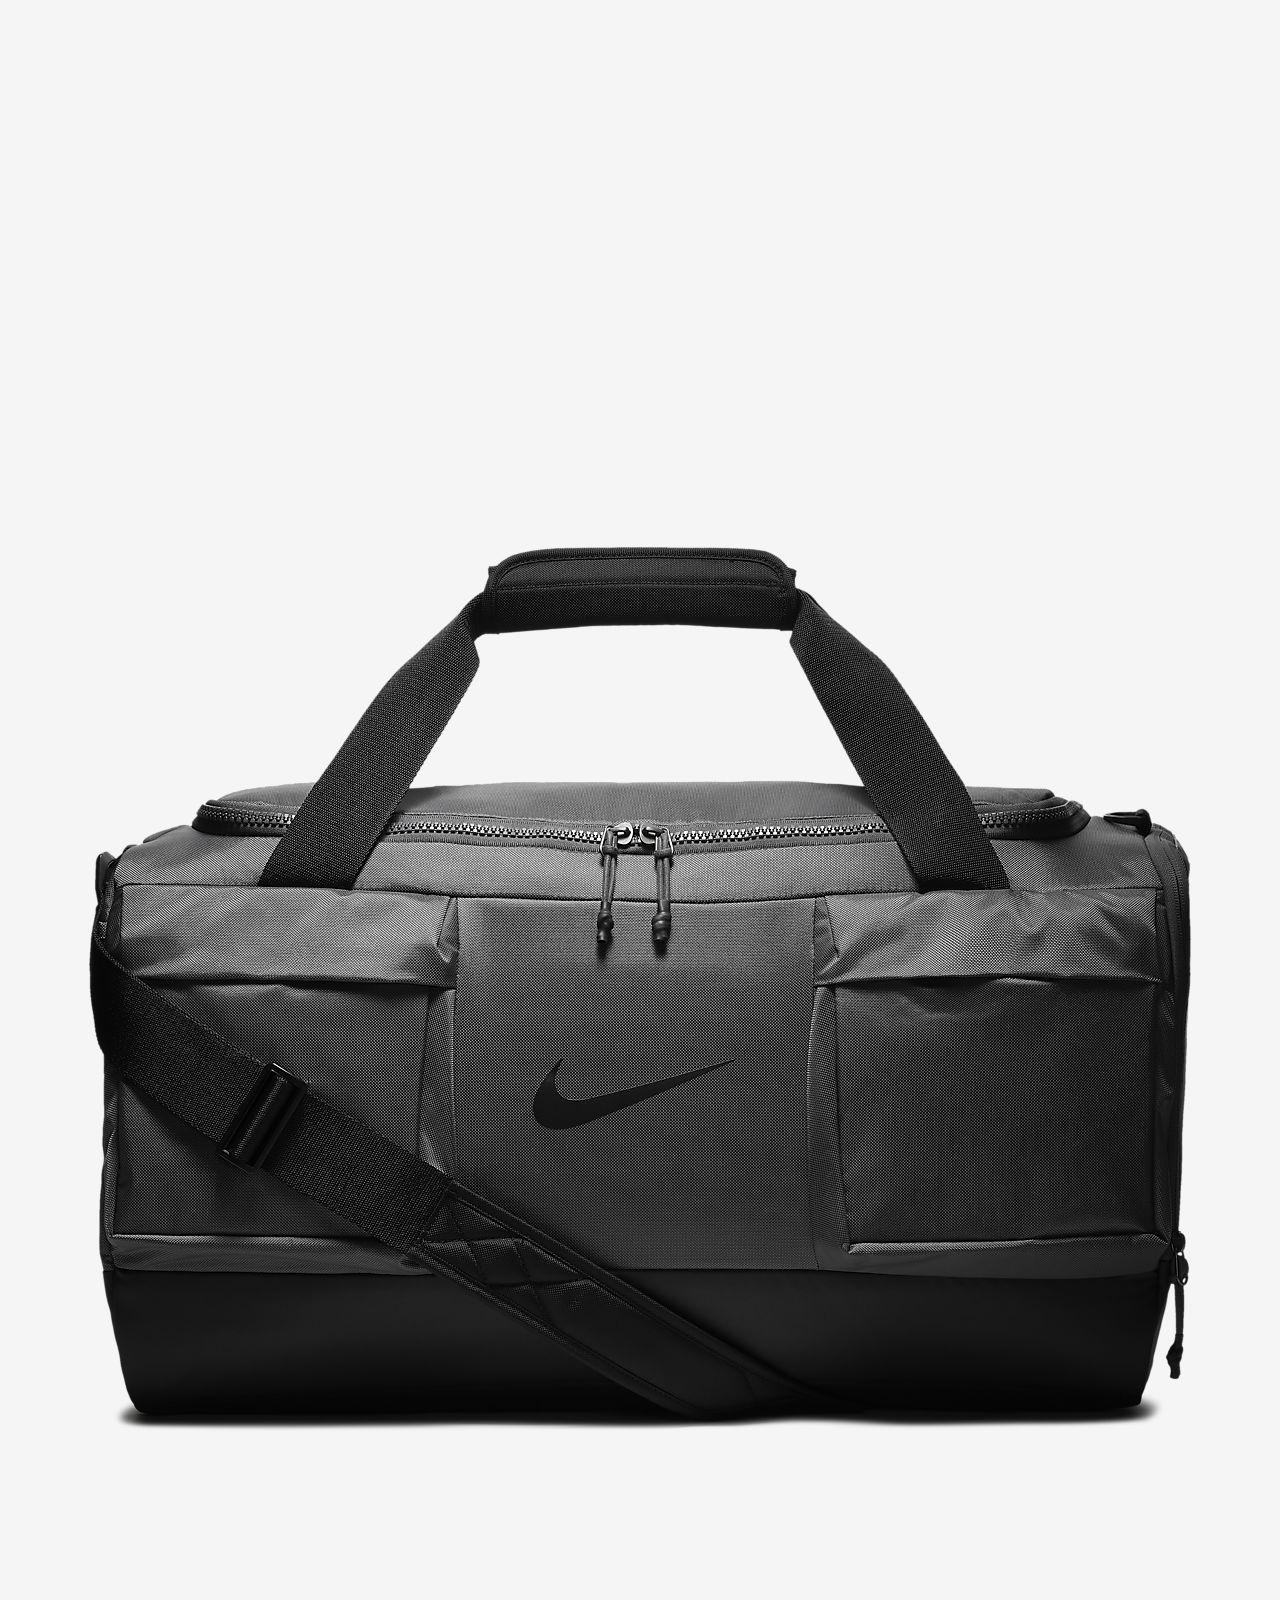 Nike Vapor Power Bossa d'esport d'entrenament (mitjana)